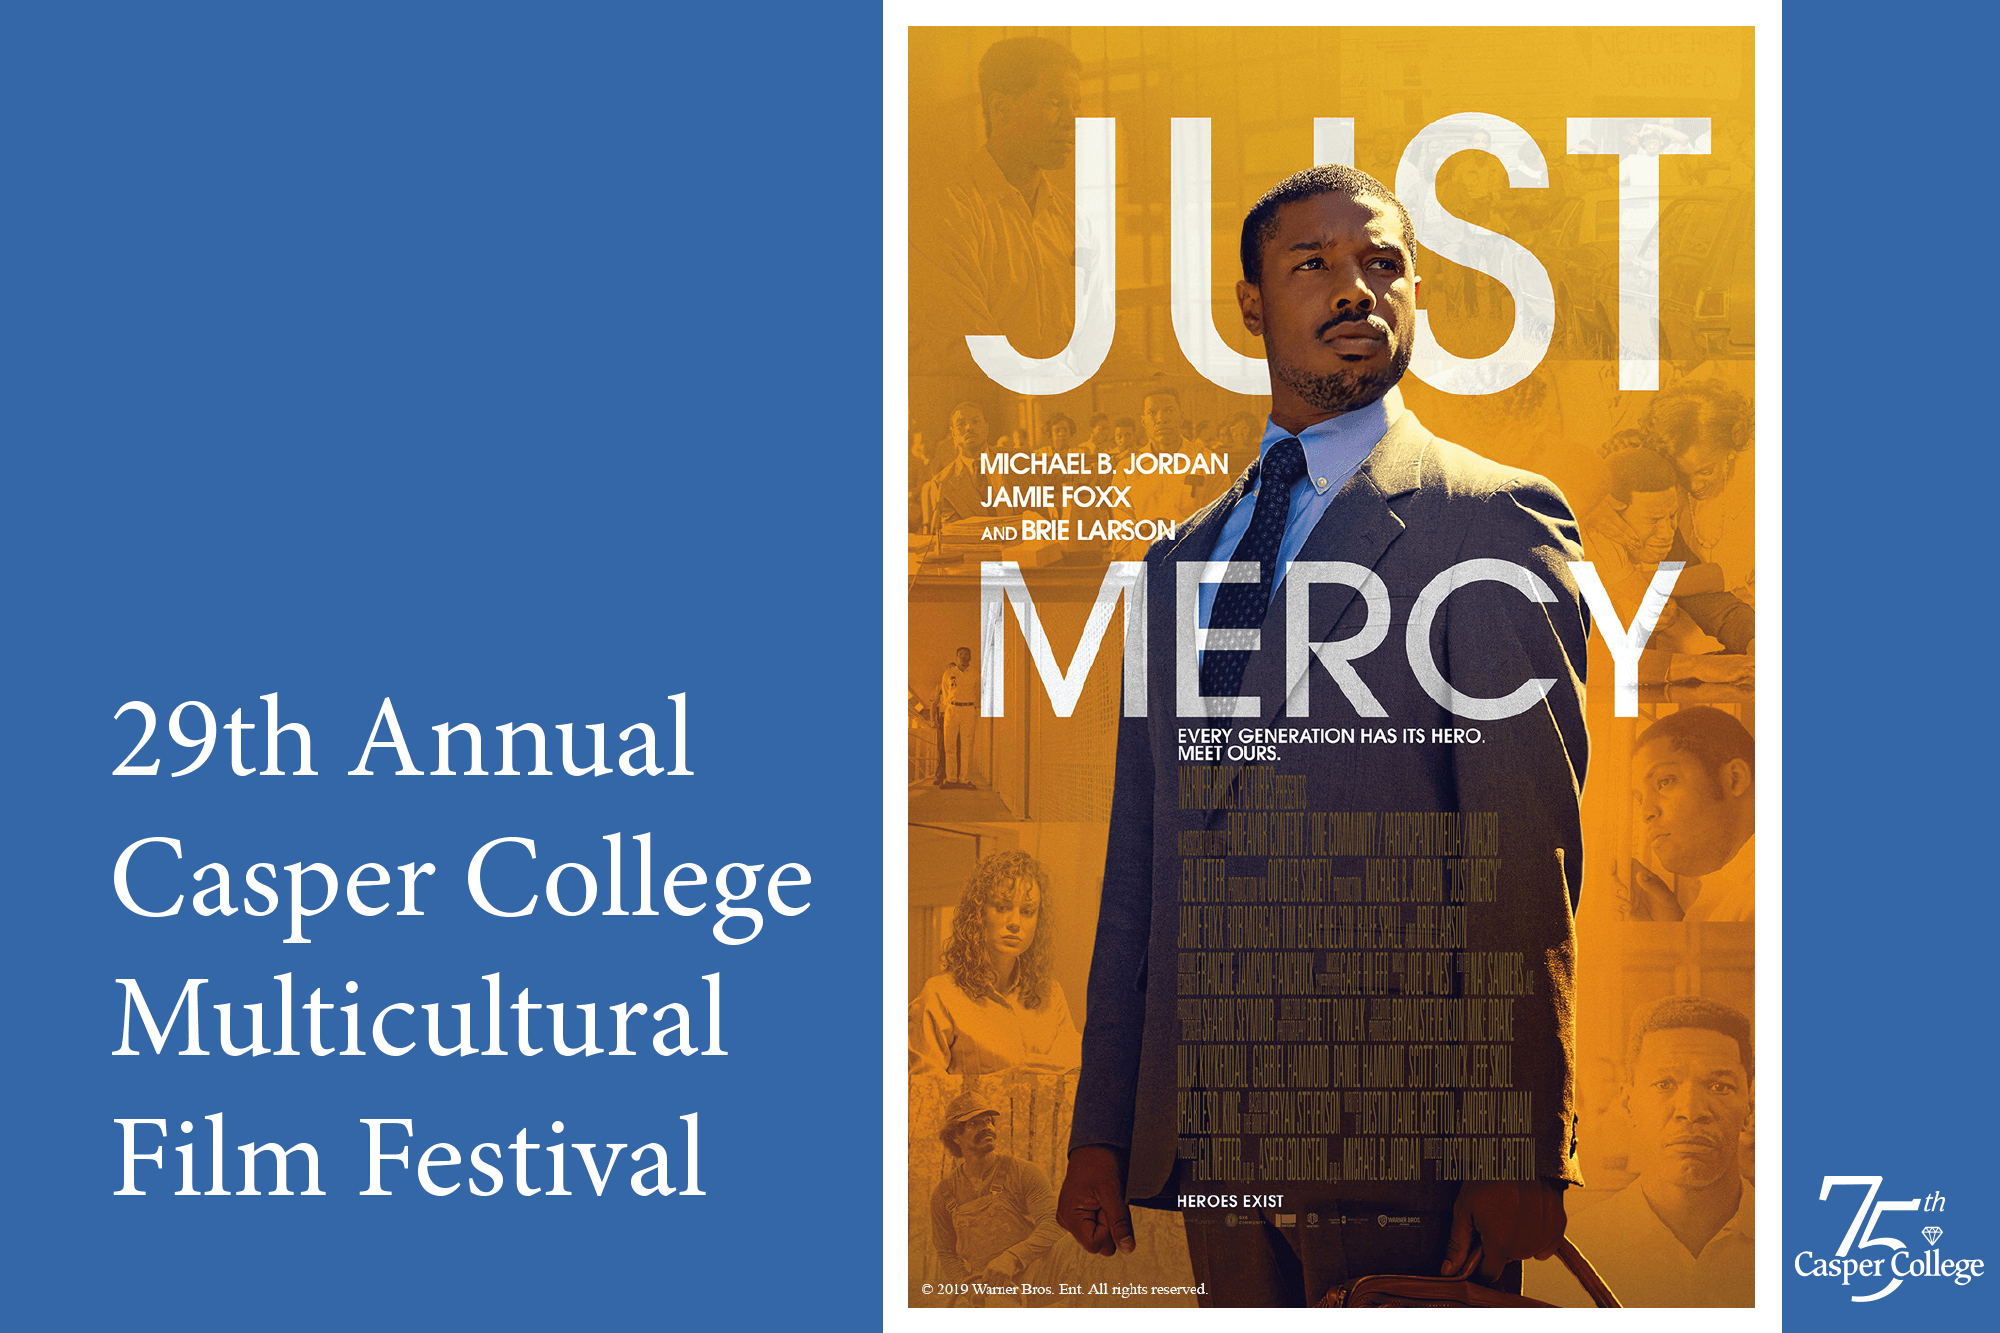 Image for second Casper College Multicultural Film Festival showing.